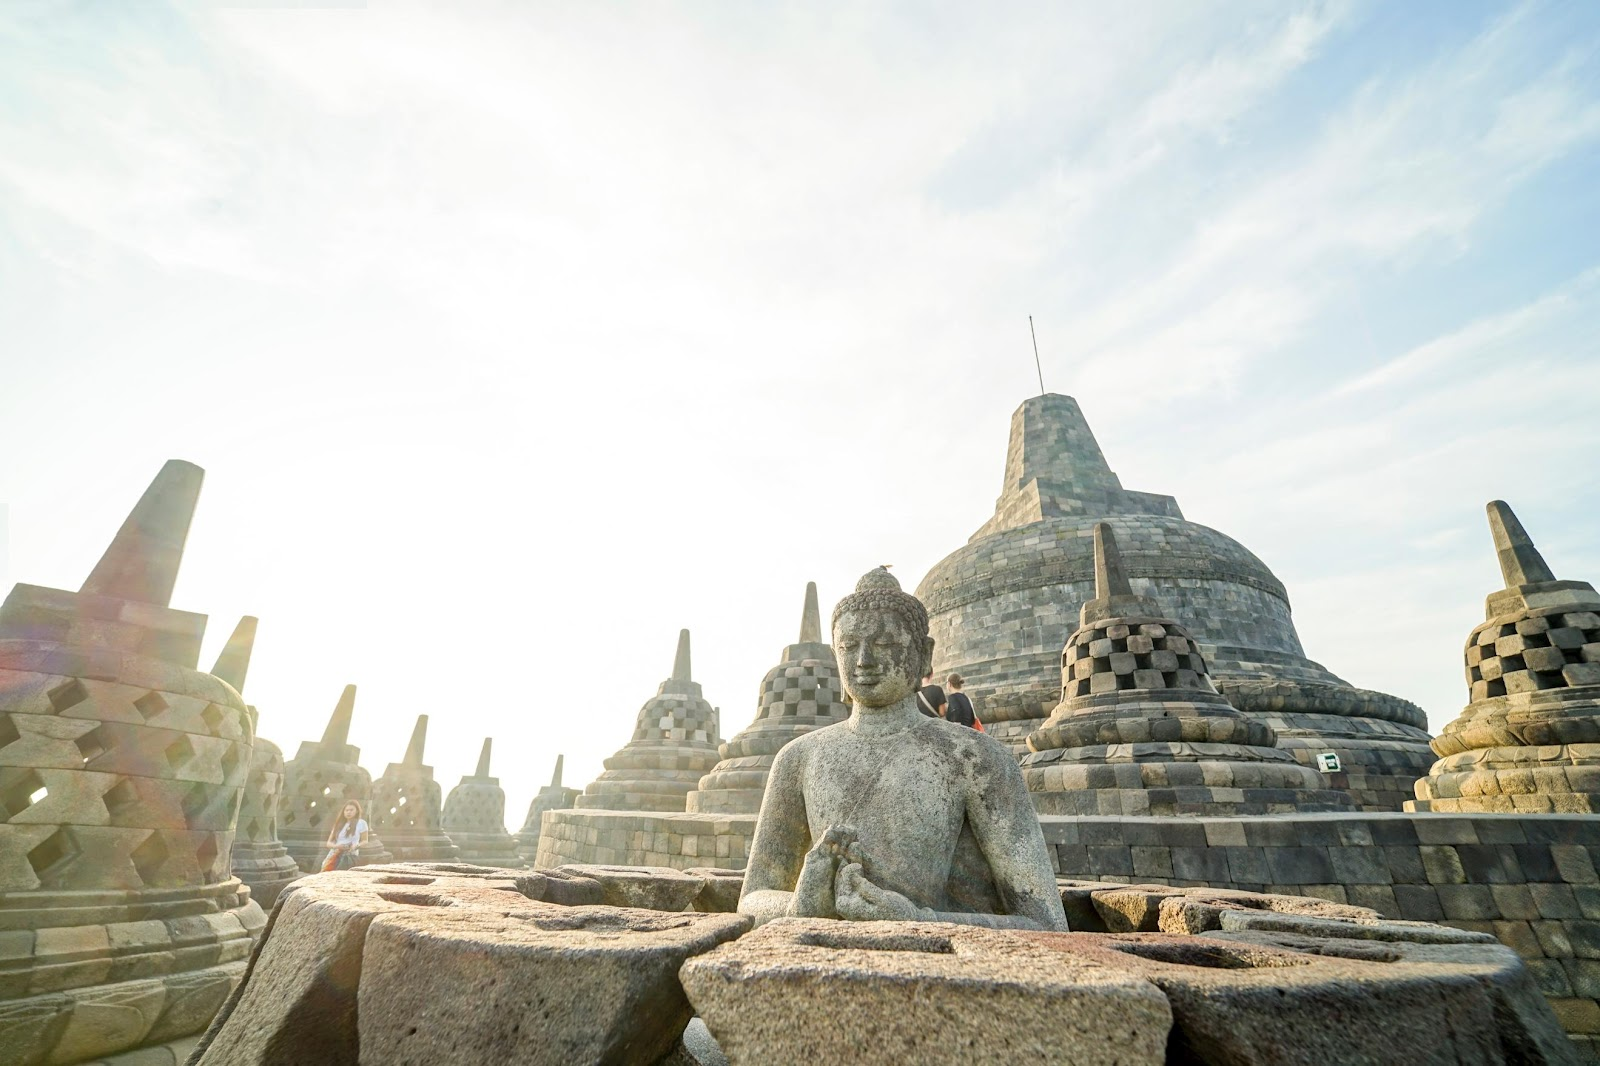 /Volumes/MAYANGWORK/KEMENPARKRAF/DIY/DIY/CANDI BOROBUDUR/APPS/VIRTUAL TOUR/ALL FOTO/Borobudur-000139.jpg